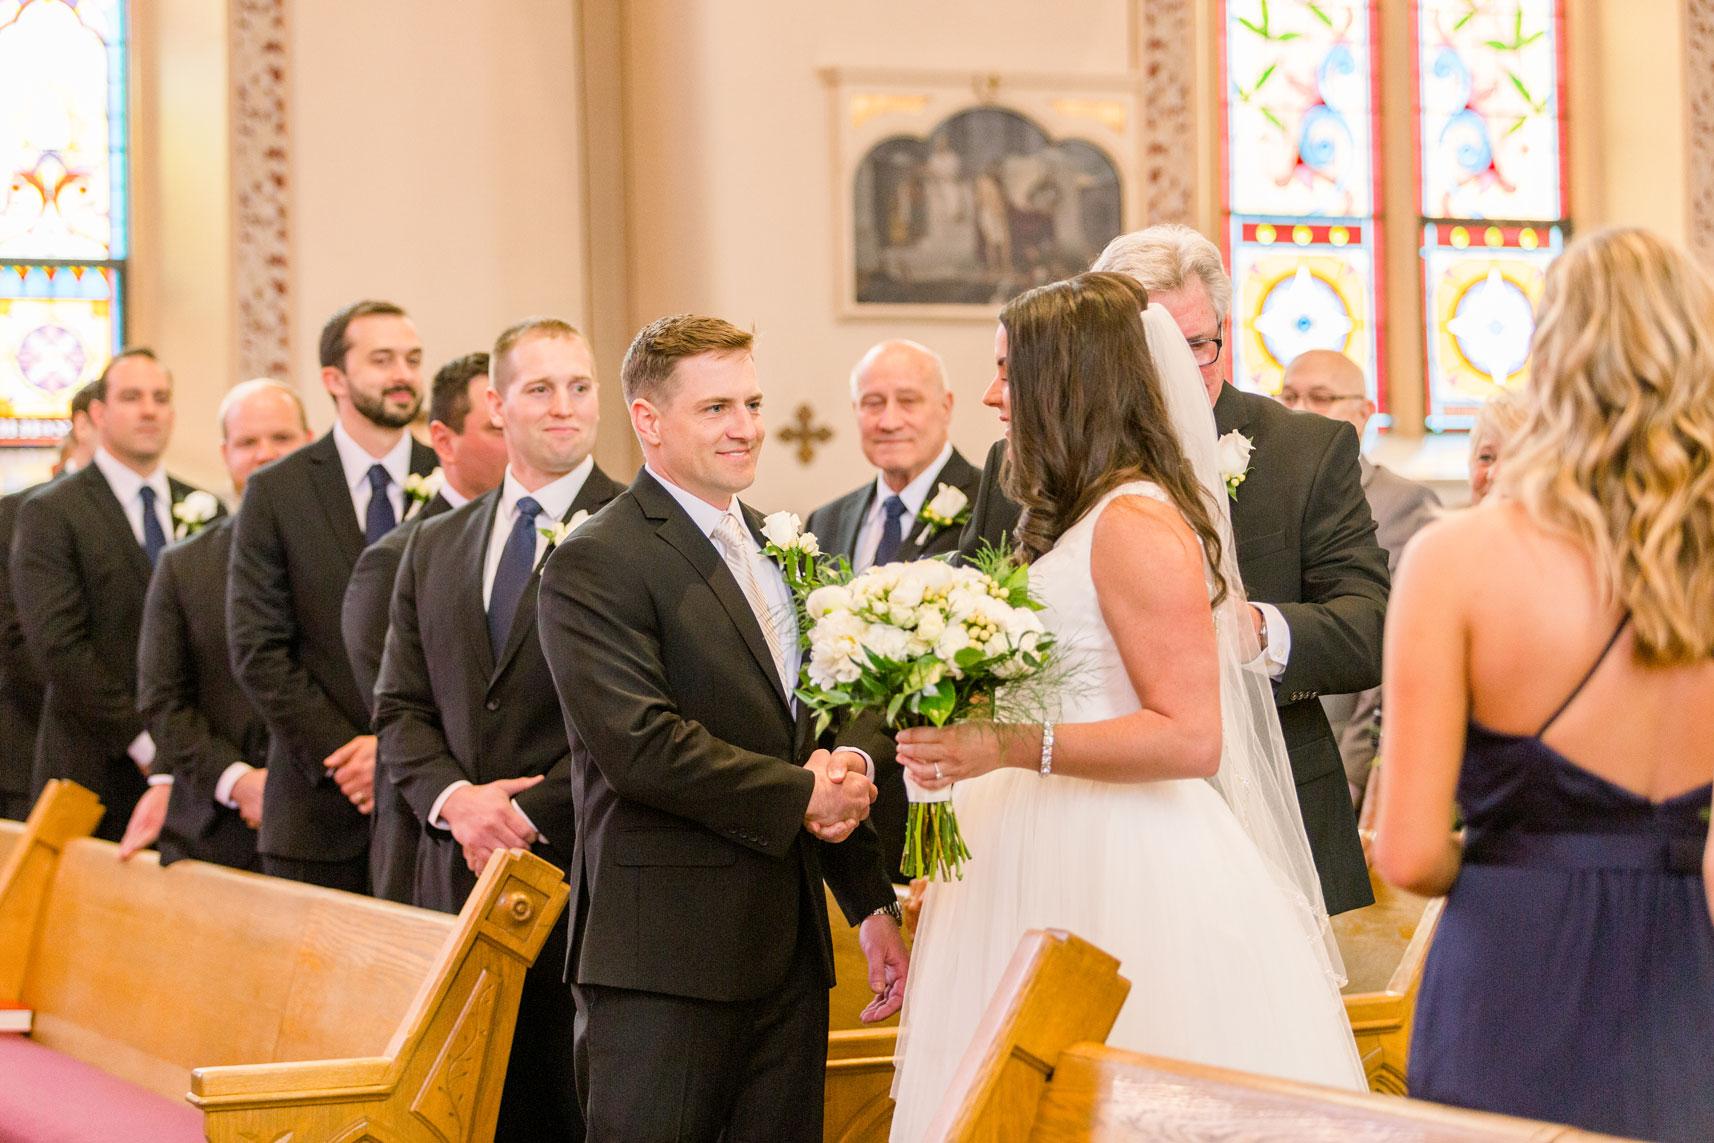 Konz-Bigaila-wedding-2017-40.jpg